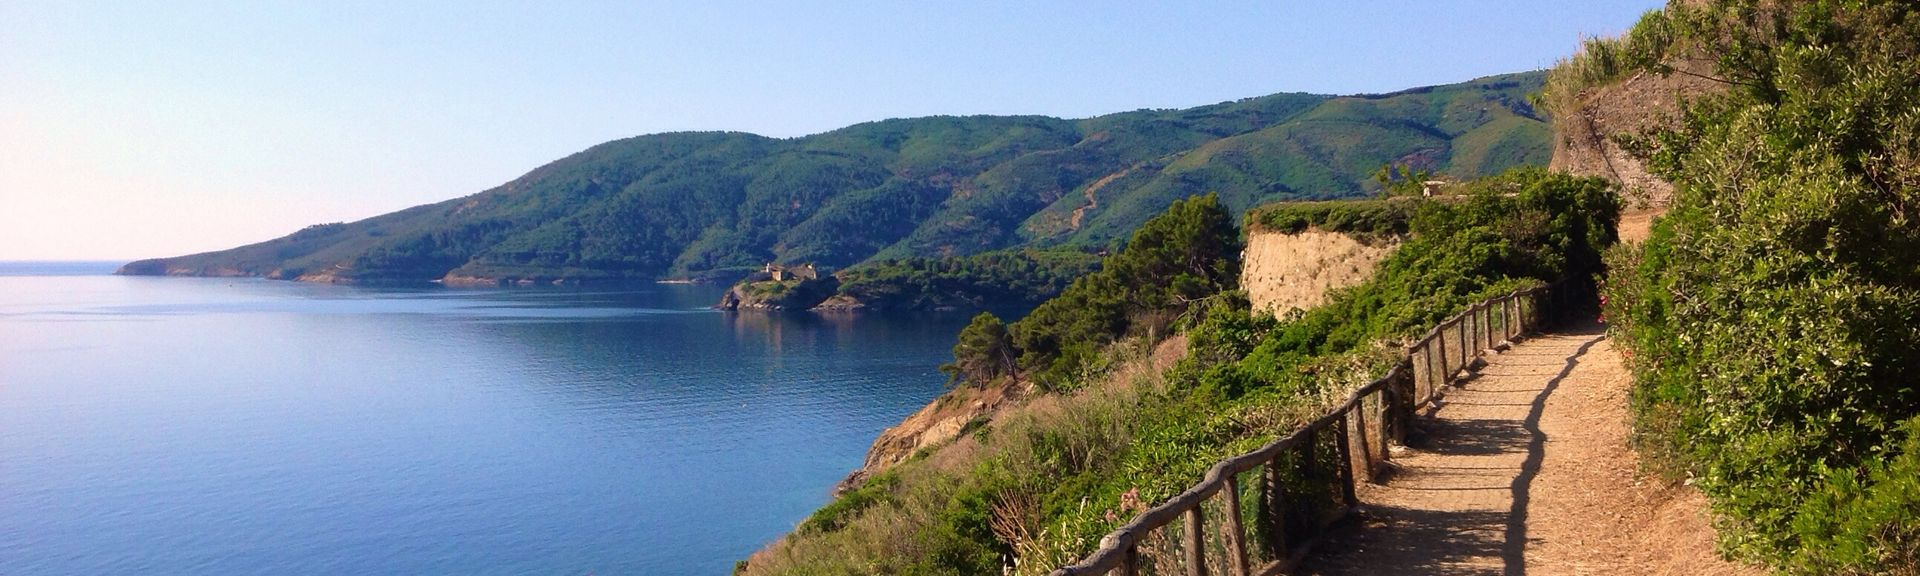 Ilha de Elba, Itália